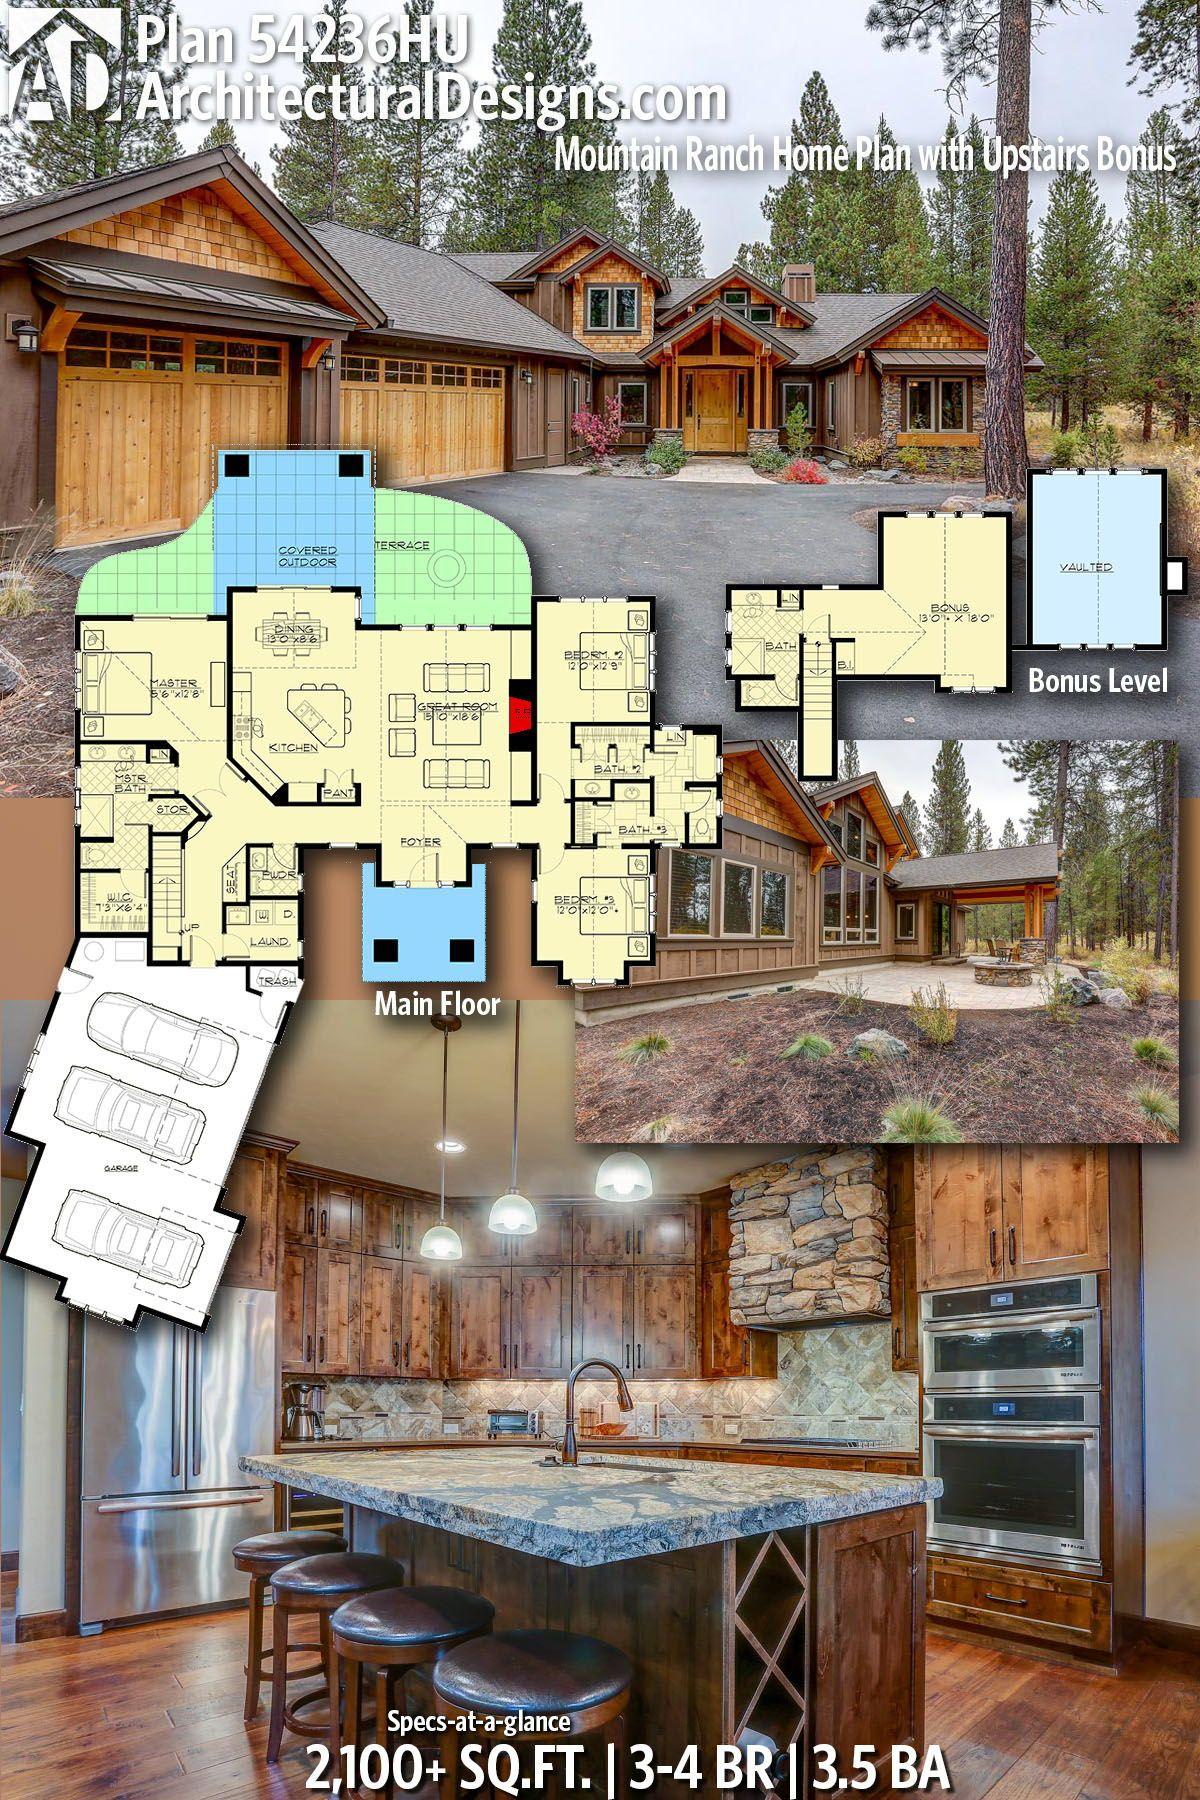 Plan 54236hu Mountain Ranch Home With Upstairs Bonus